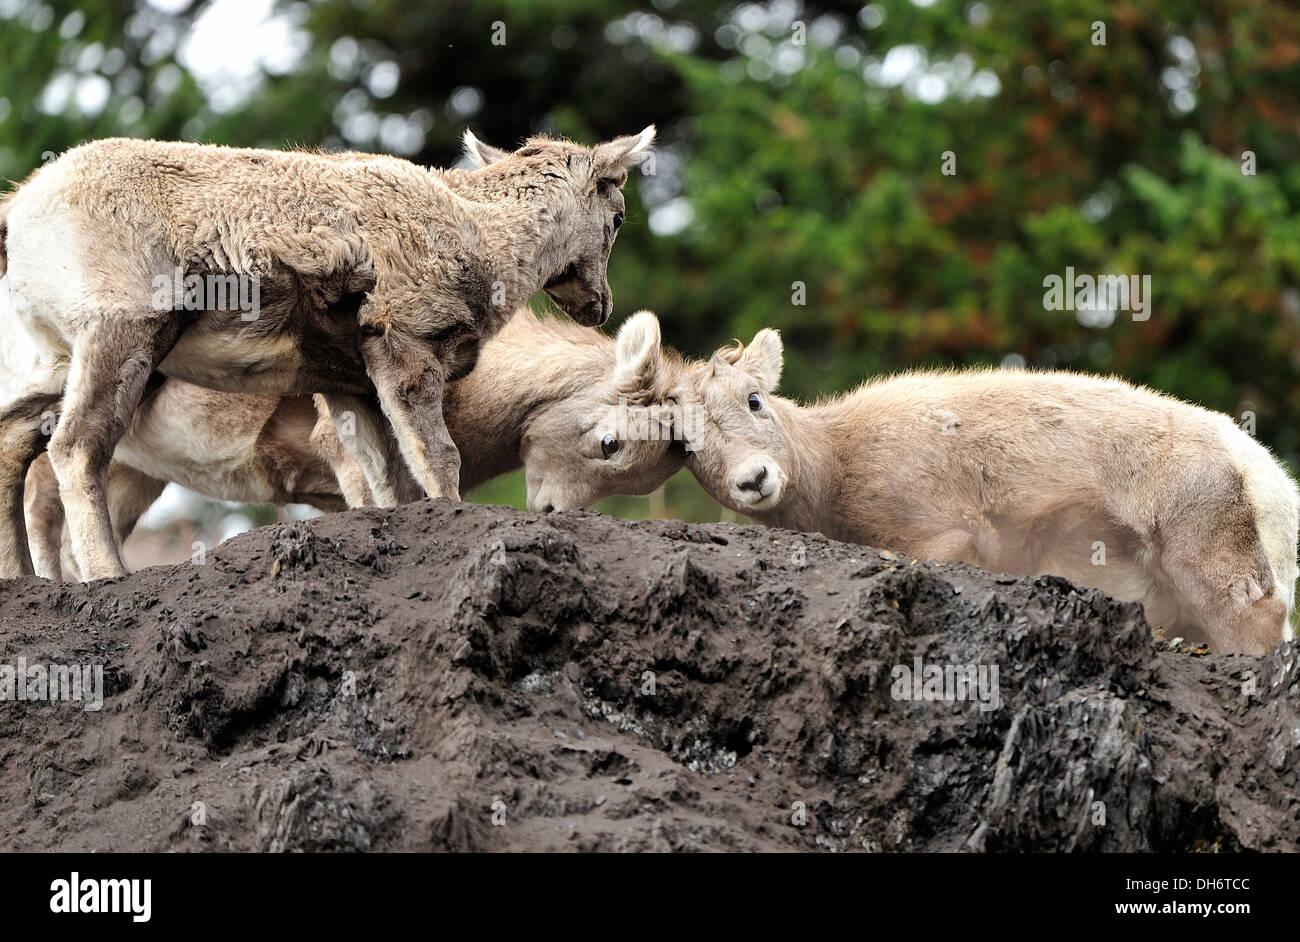 Bighorn sheep kids butting heads - Stock Image